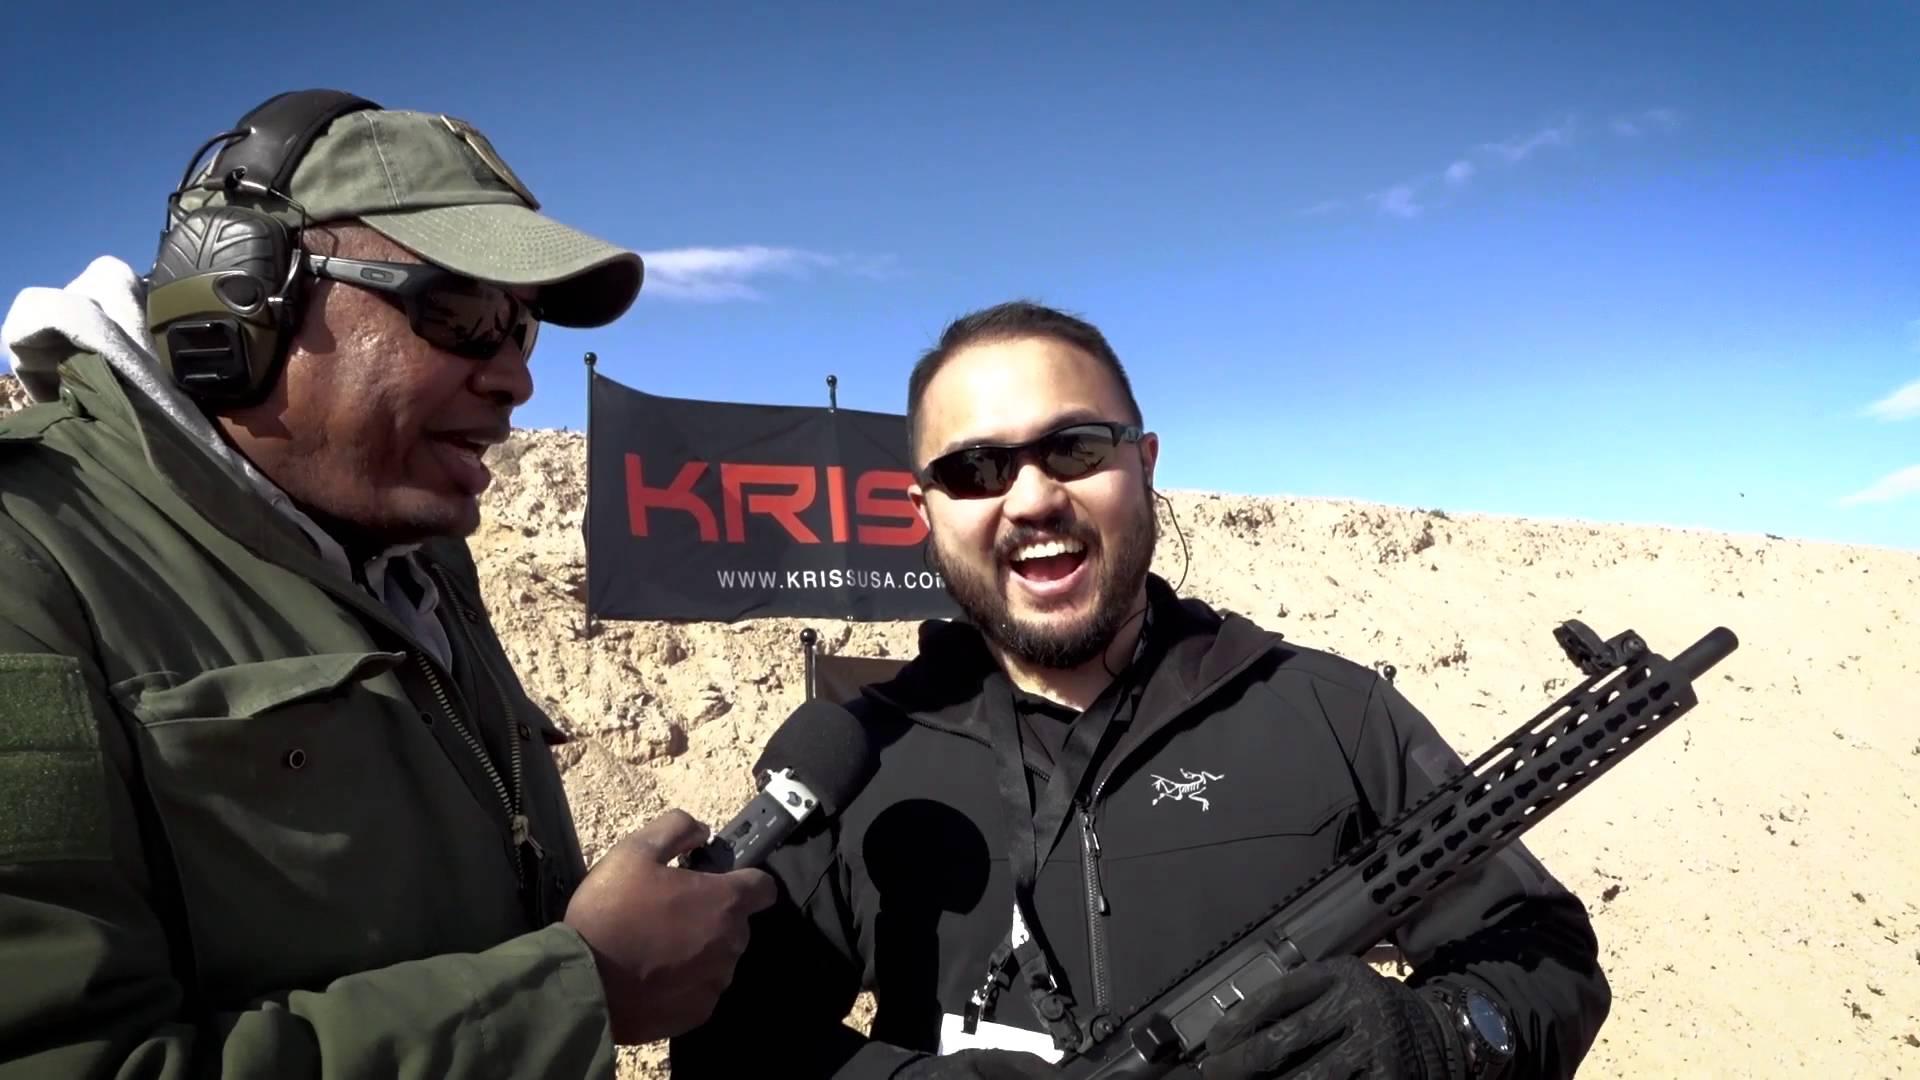 Defiance DMK 22 Rifle SHOT Show 2016 Media Day